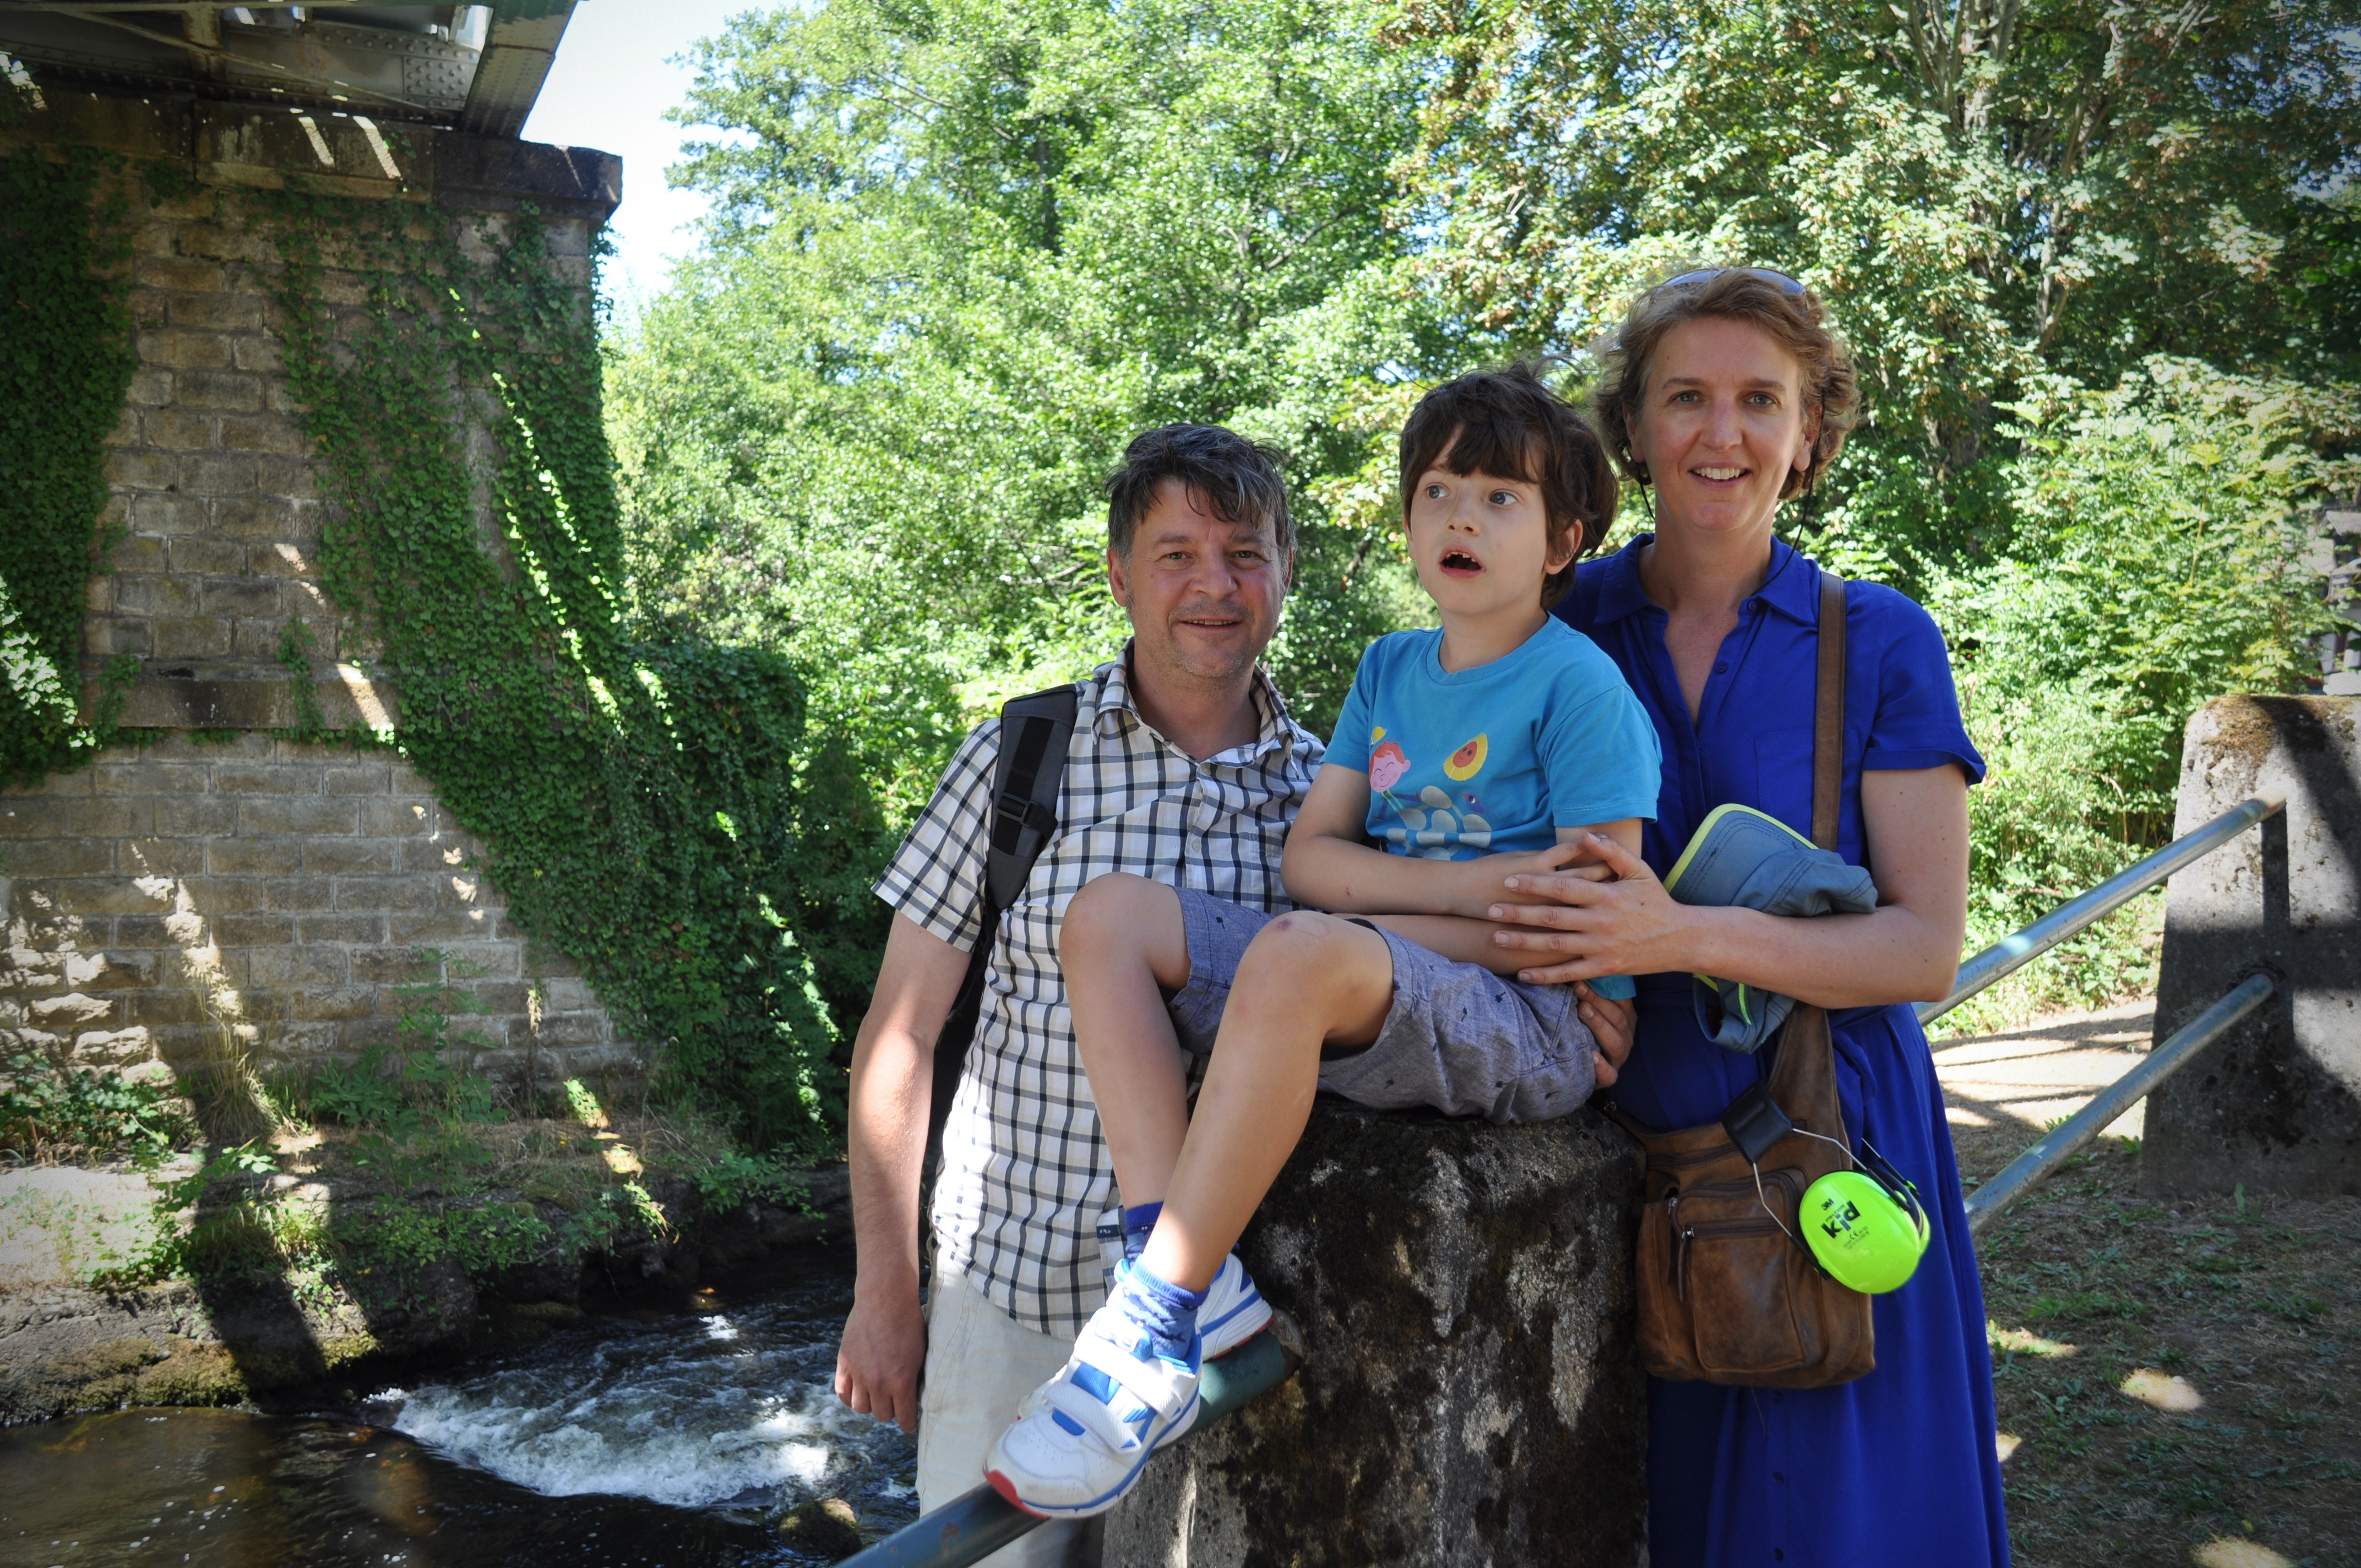 gezinsfotos (4)